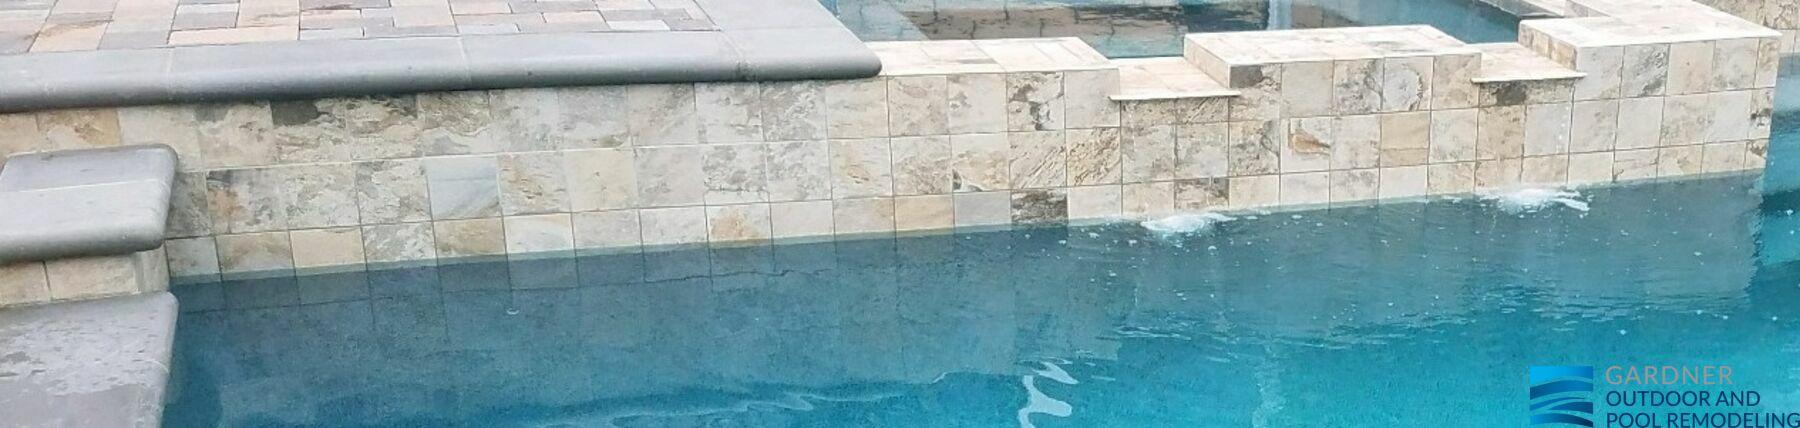 Pool Tiles Renovation In California Gardner Outdoor And Pool Remodeling